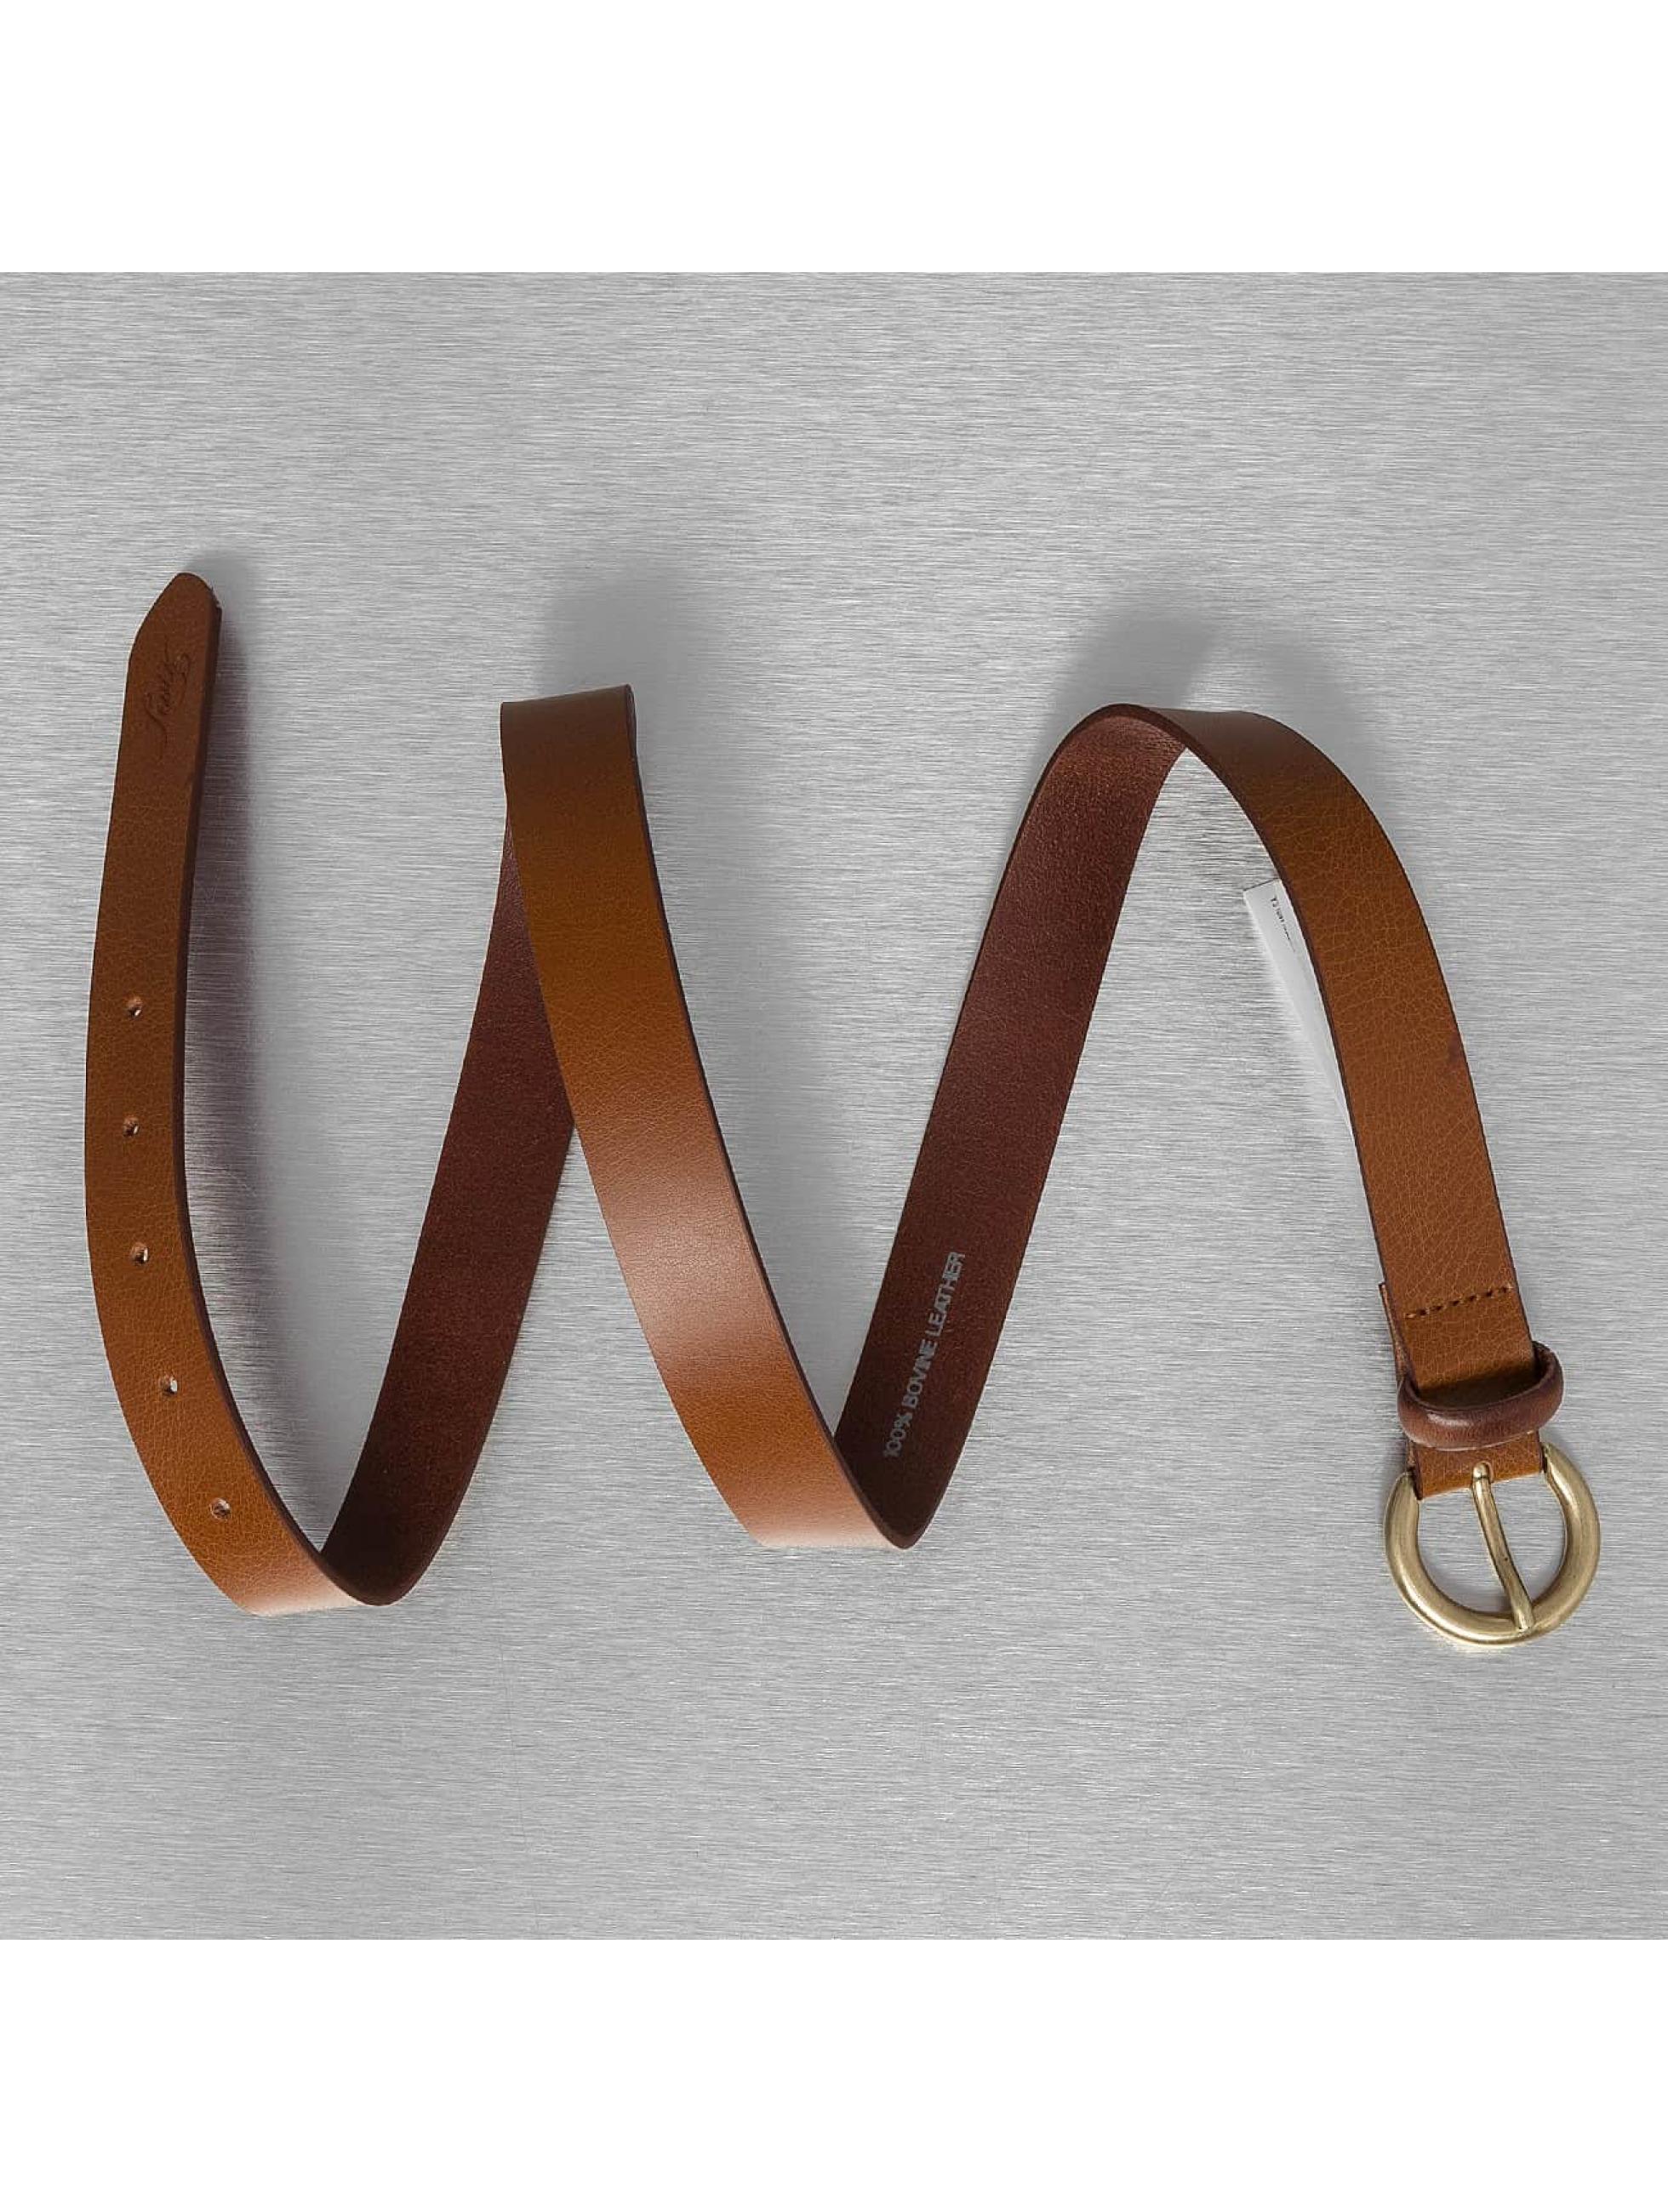 Levi's® Belt Belt brown